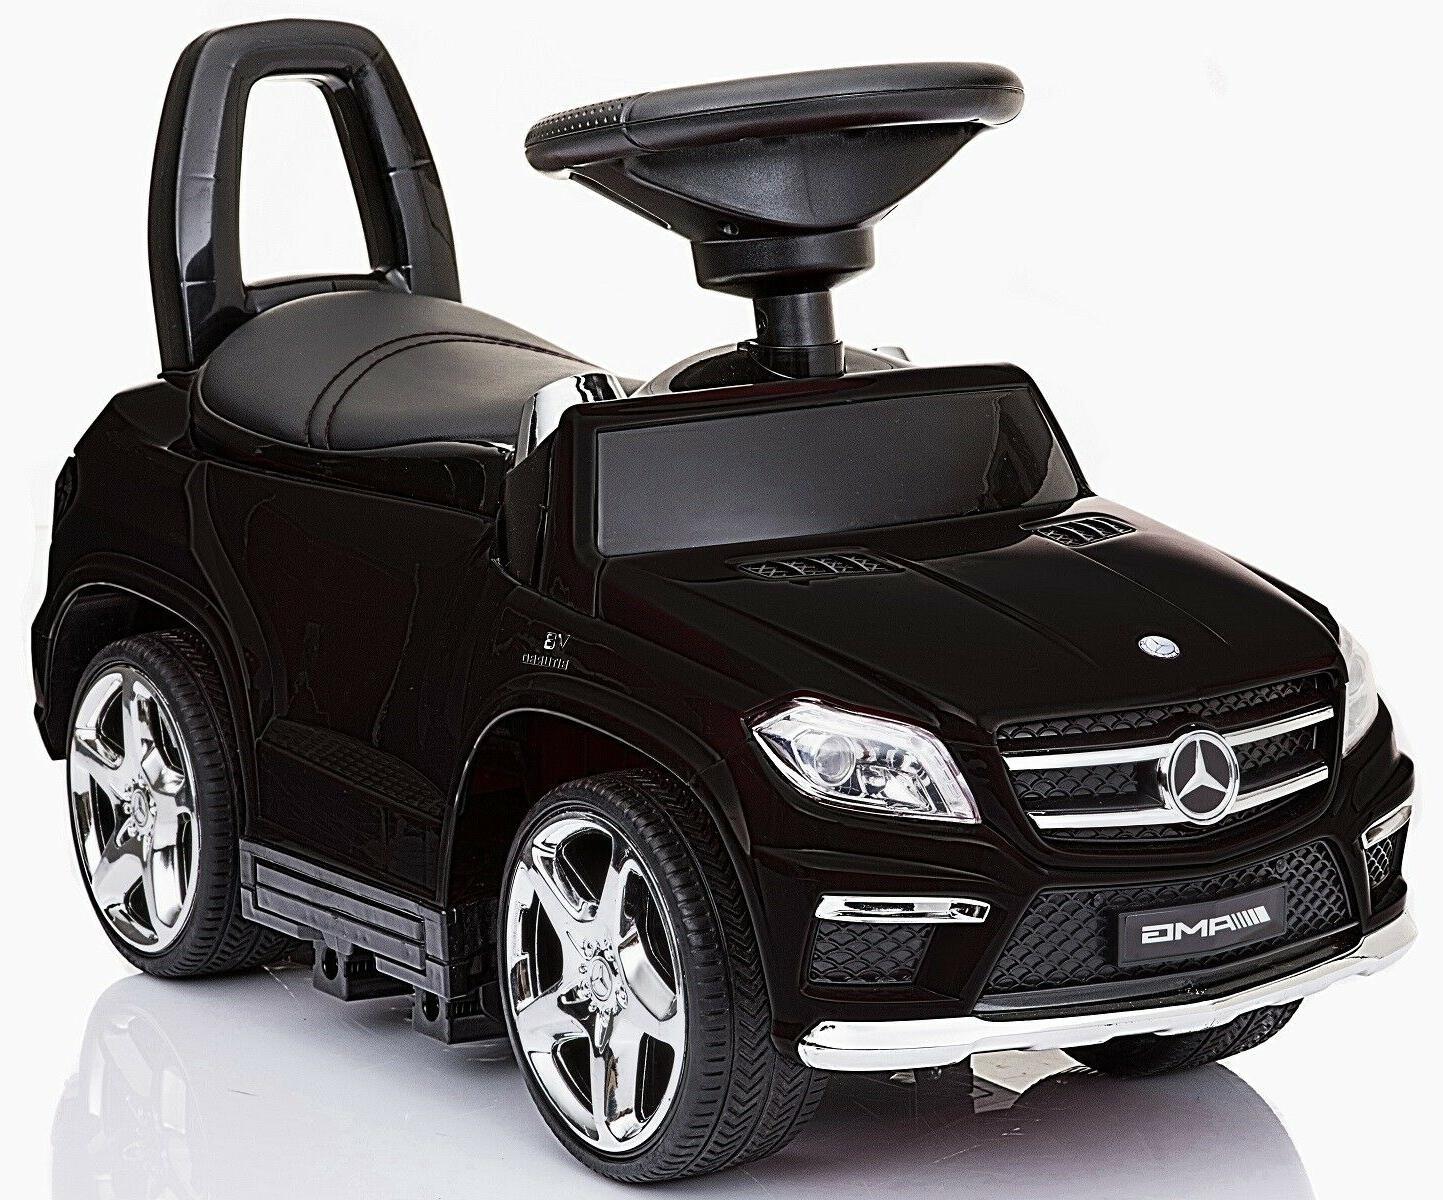 Ride On Toys Car Foot on Rocker